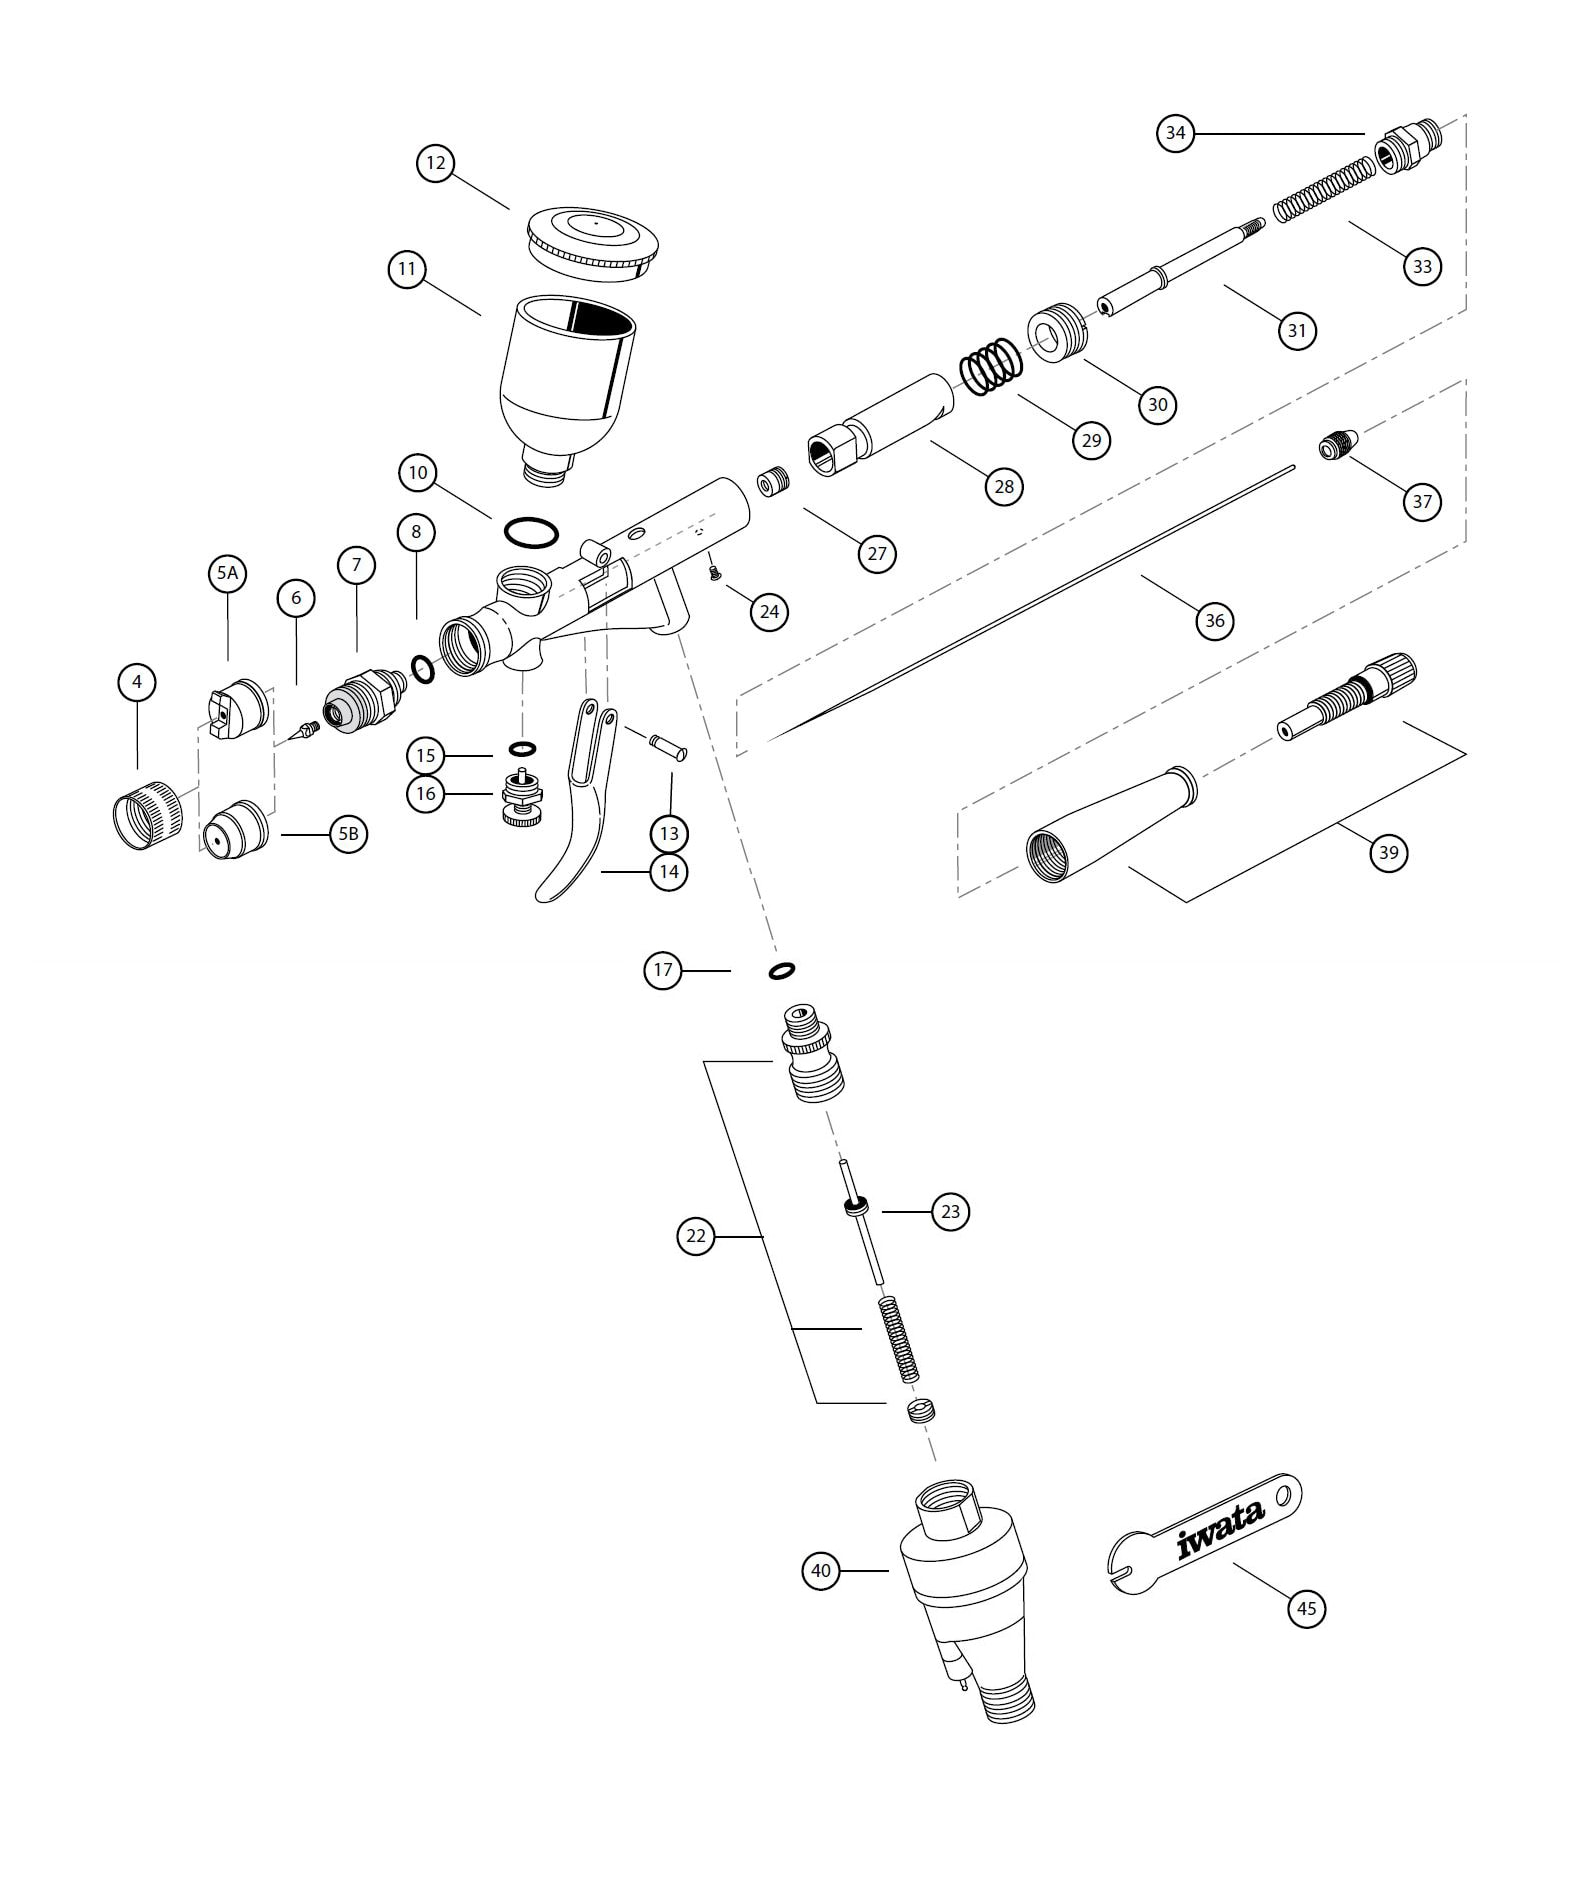 Iwata Kustom Th Airbrush Spare Parts Guide